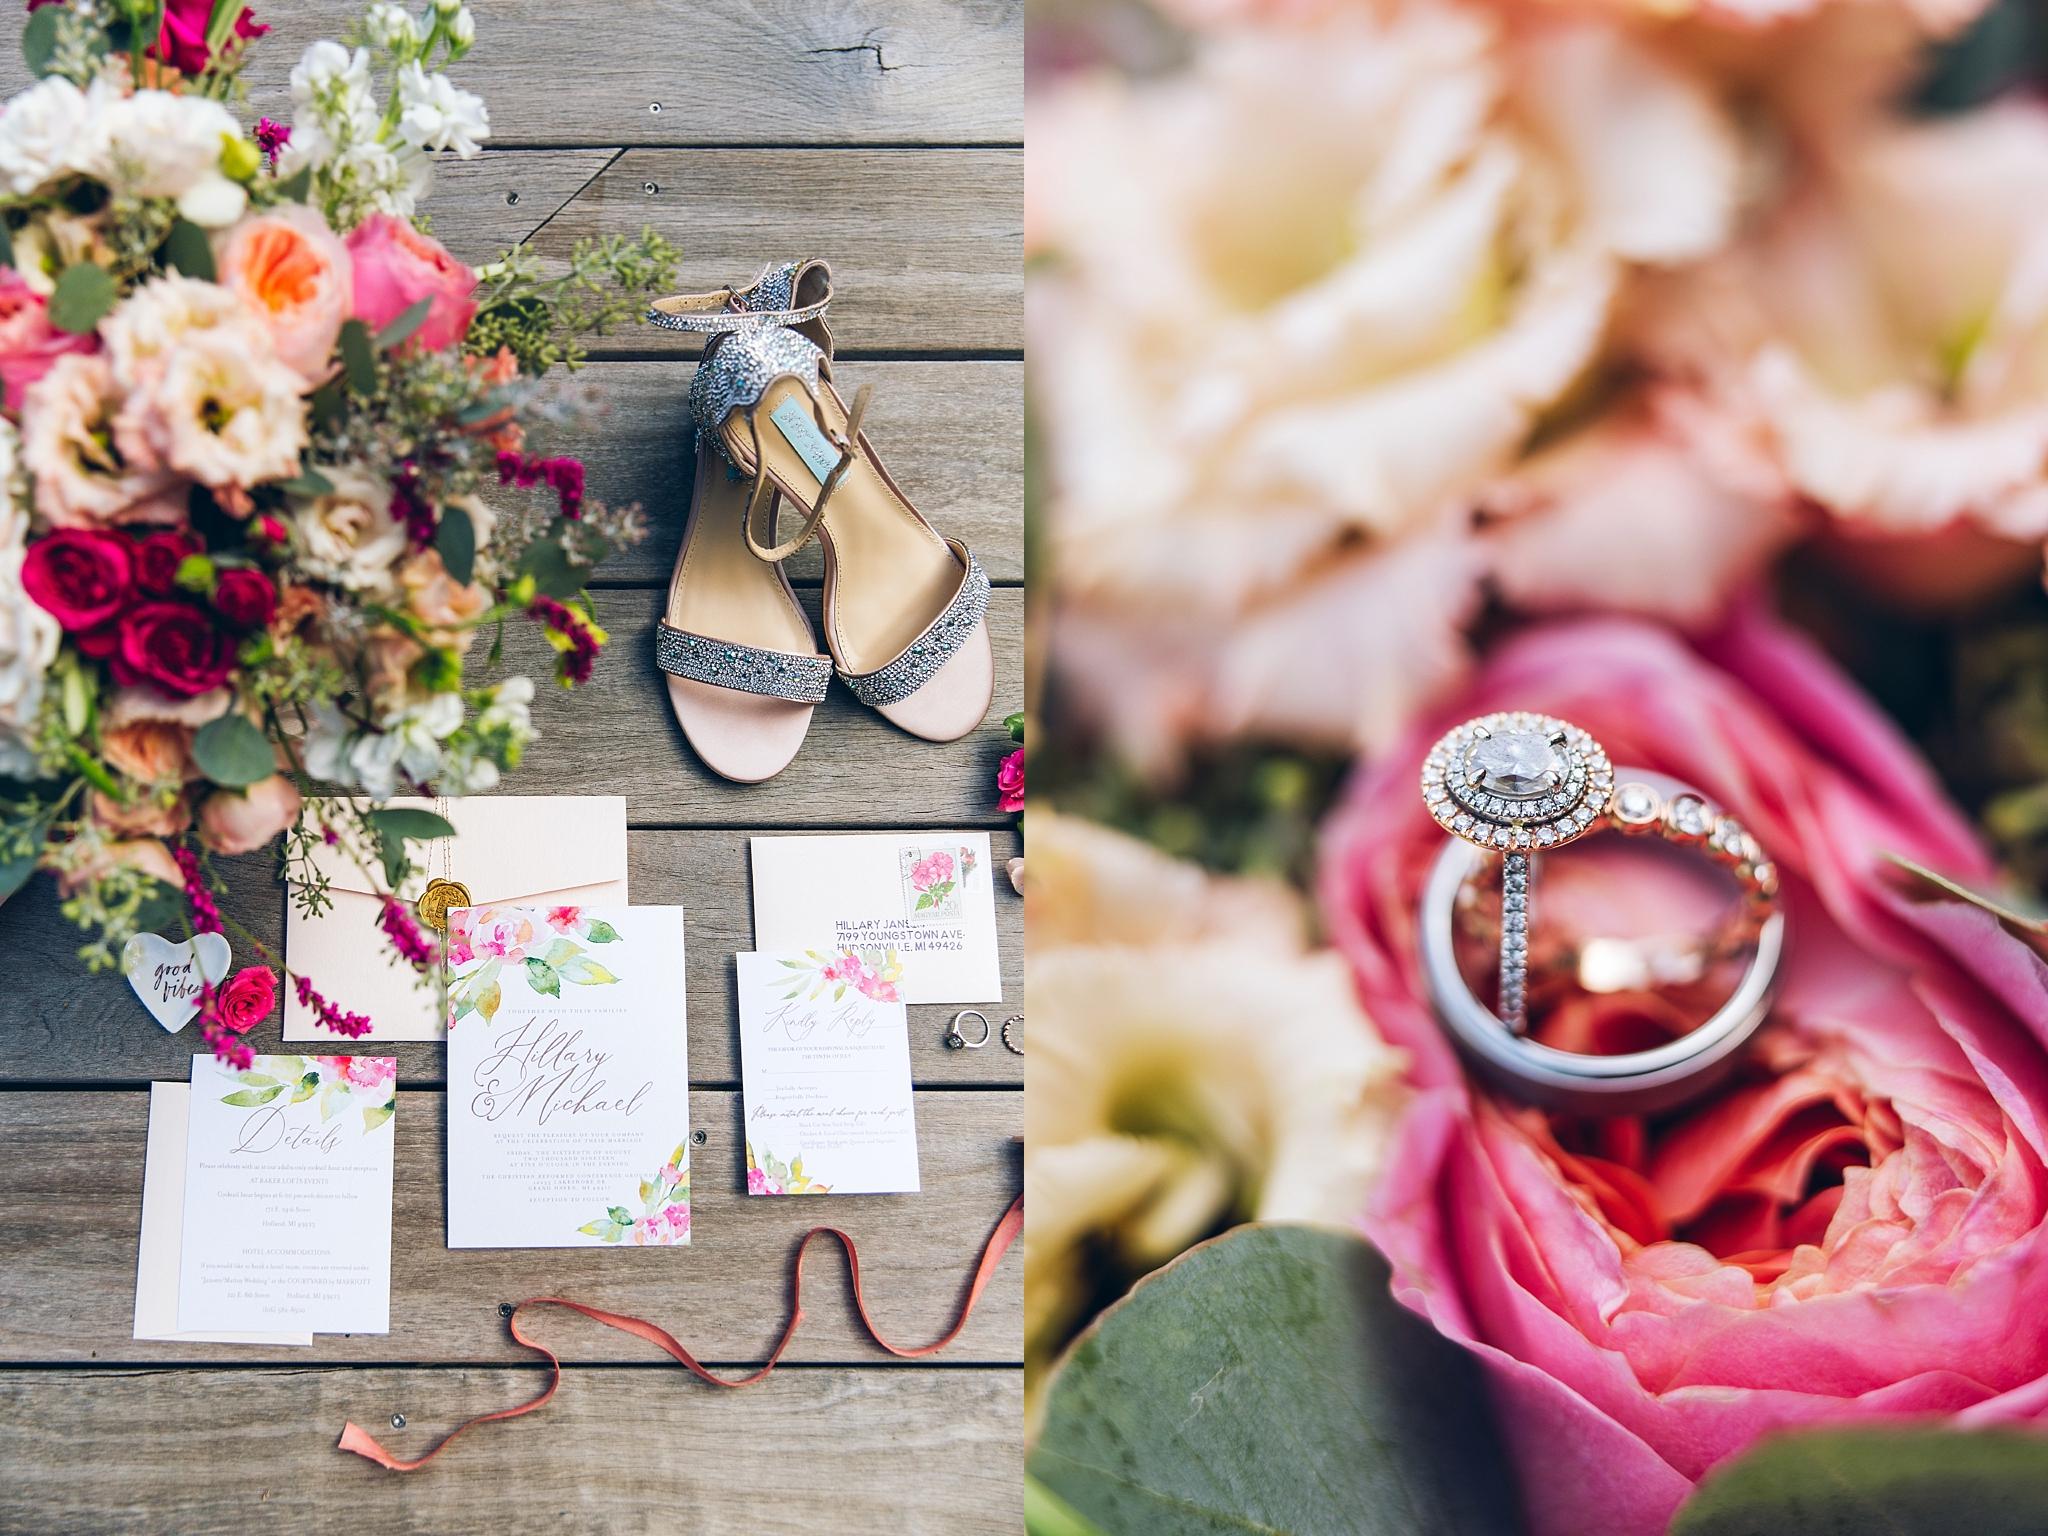 baker-lofts-holland-michigan-wedding-photographer_0292.jpg